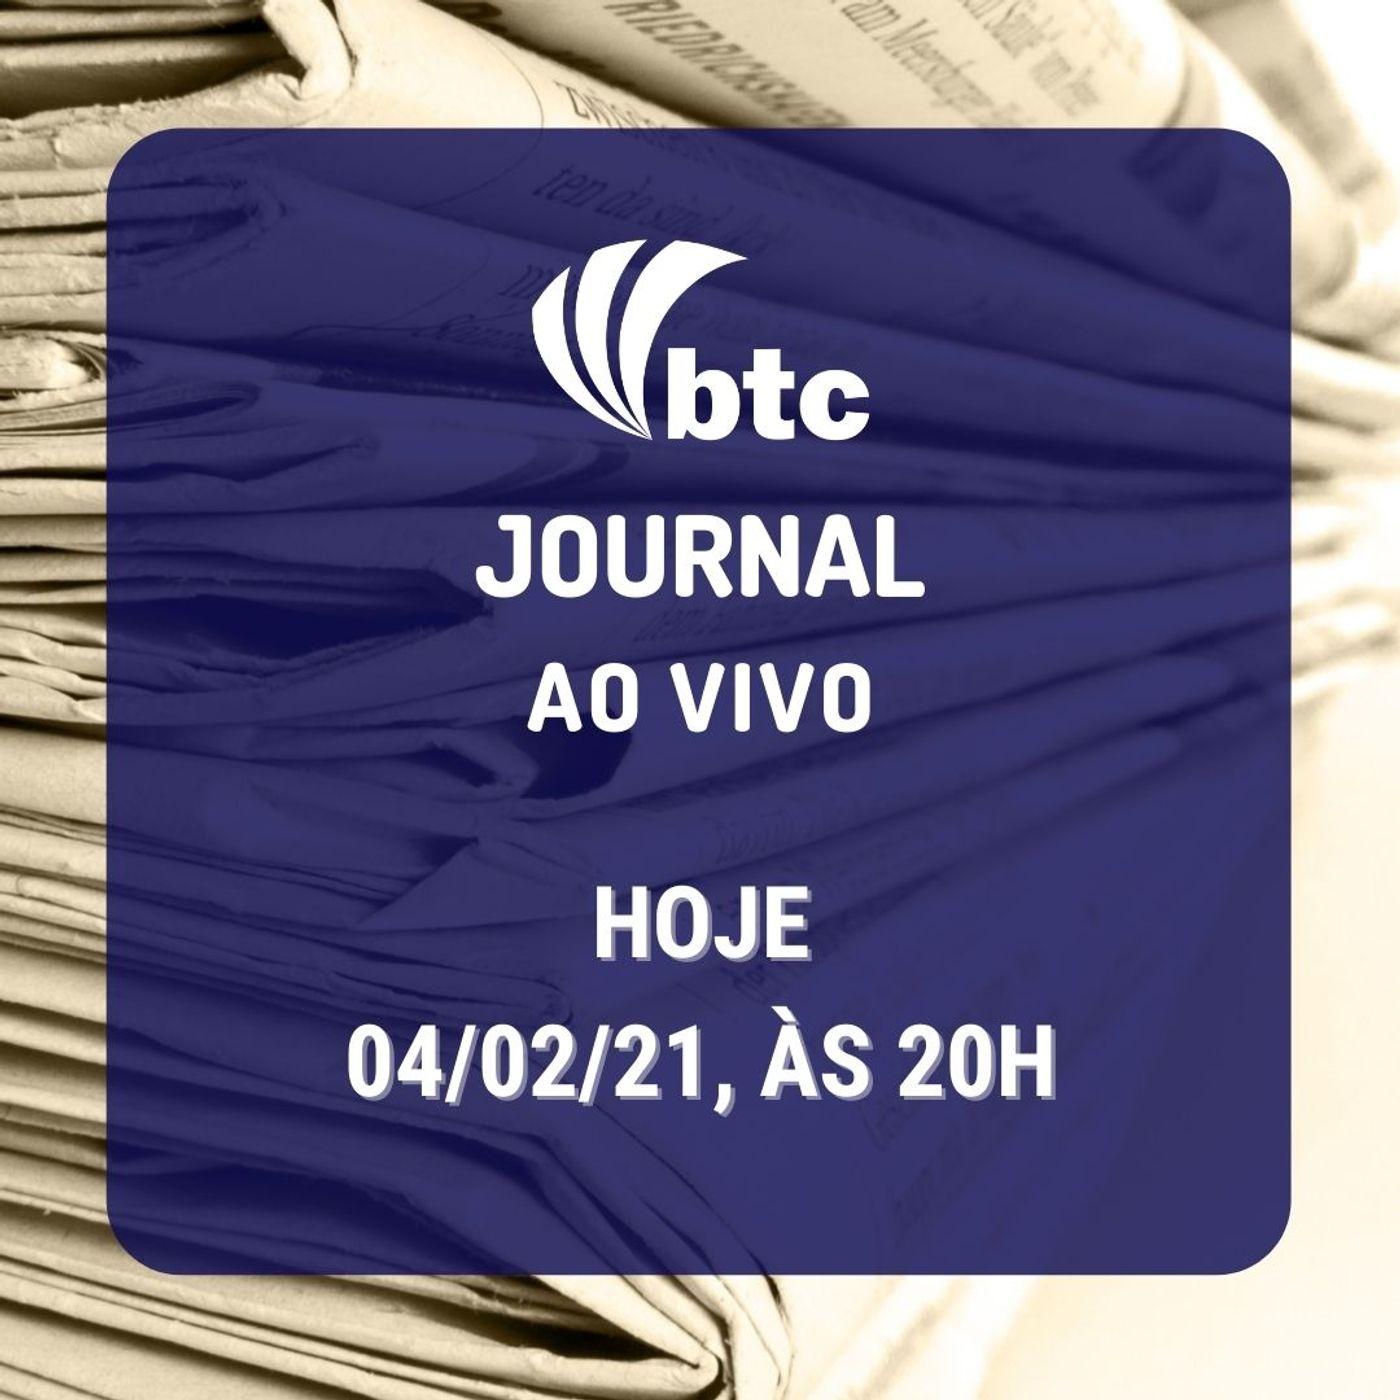 Viveo, Spotify, L'Occitane, Nubank, Livraria Cultura e Jeff Bezos   BTC Journal 04/02/20